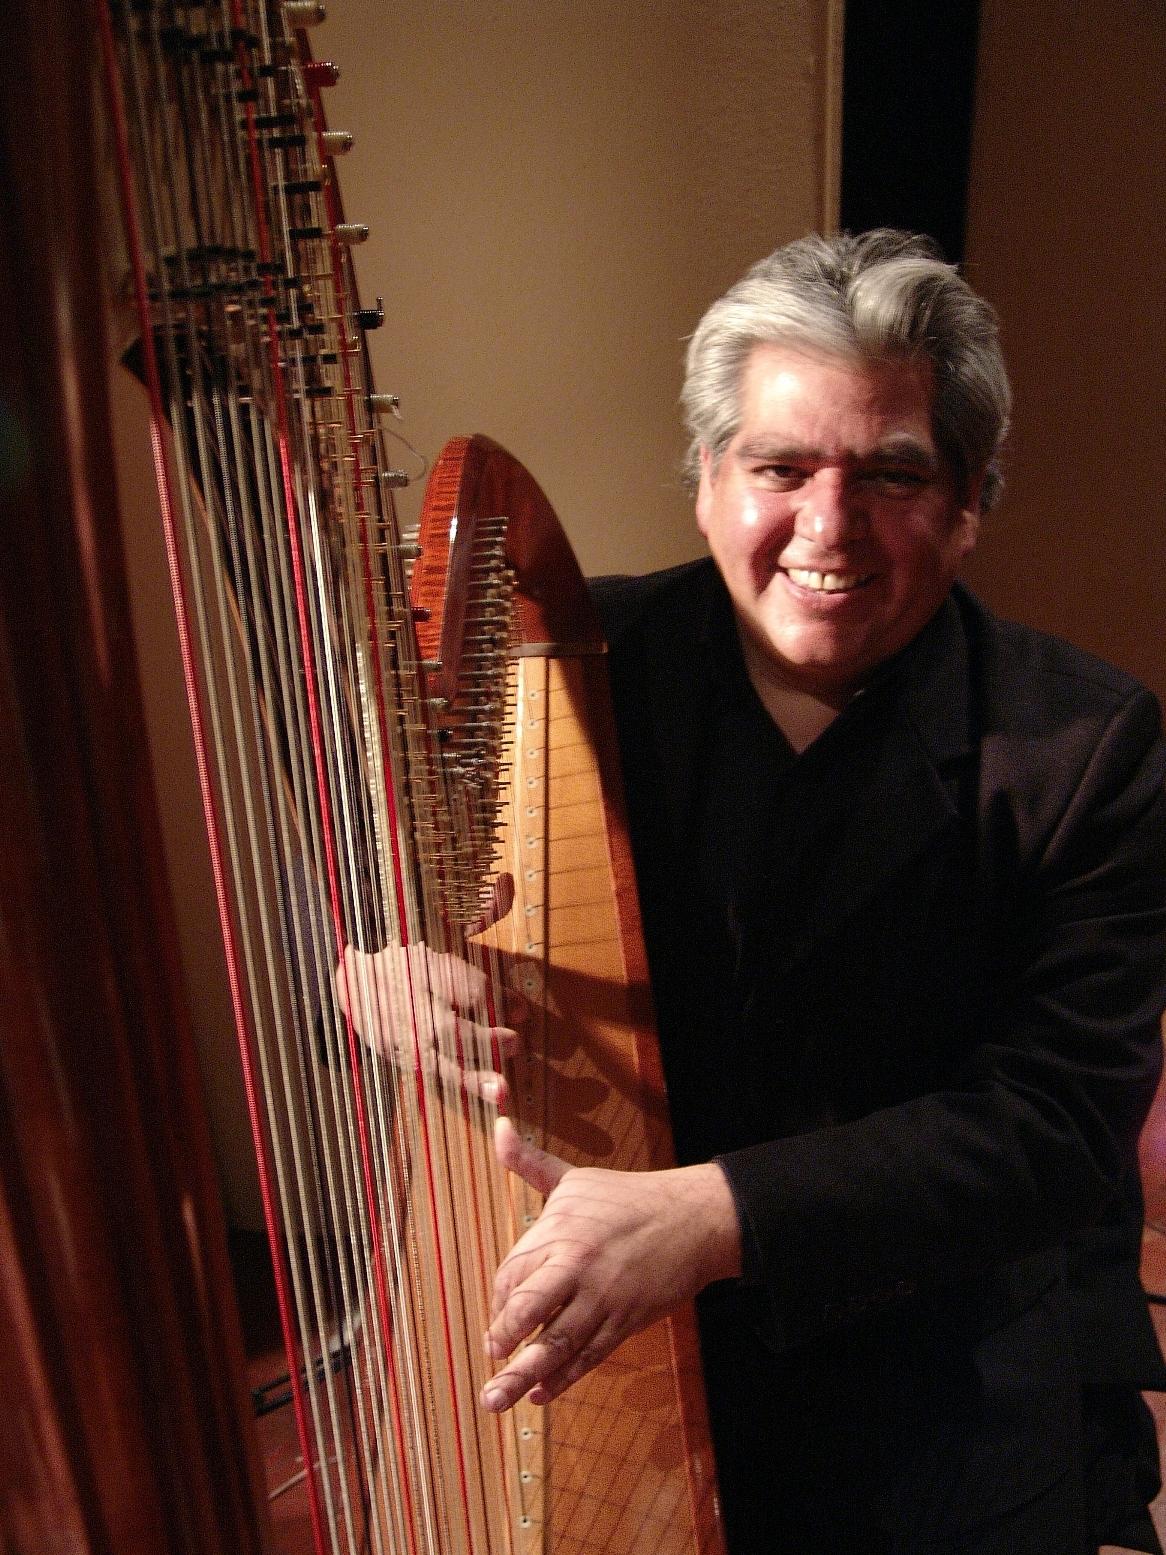 Manuel Jimenez - Concertista Arpa Clásica